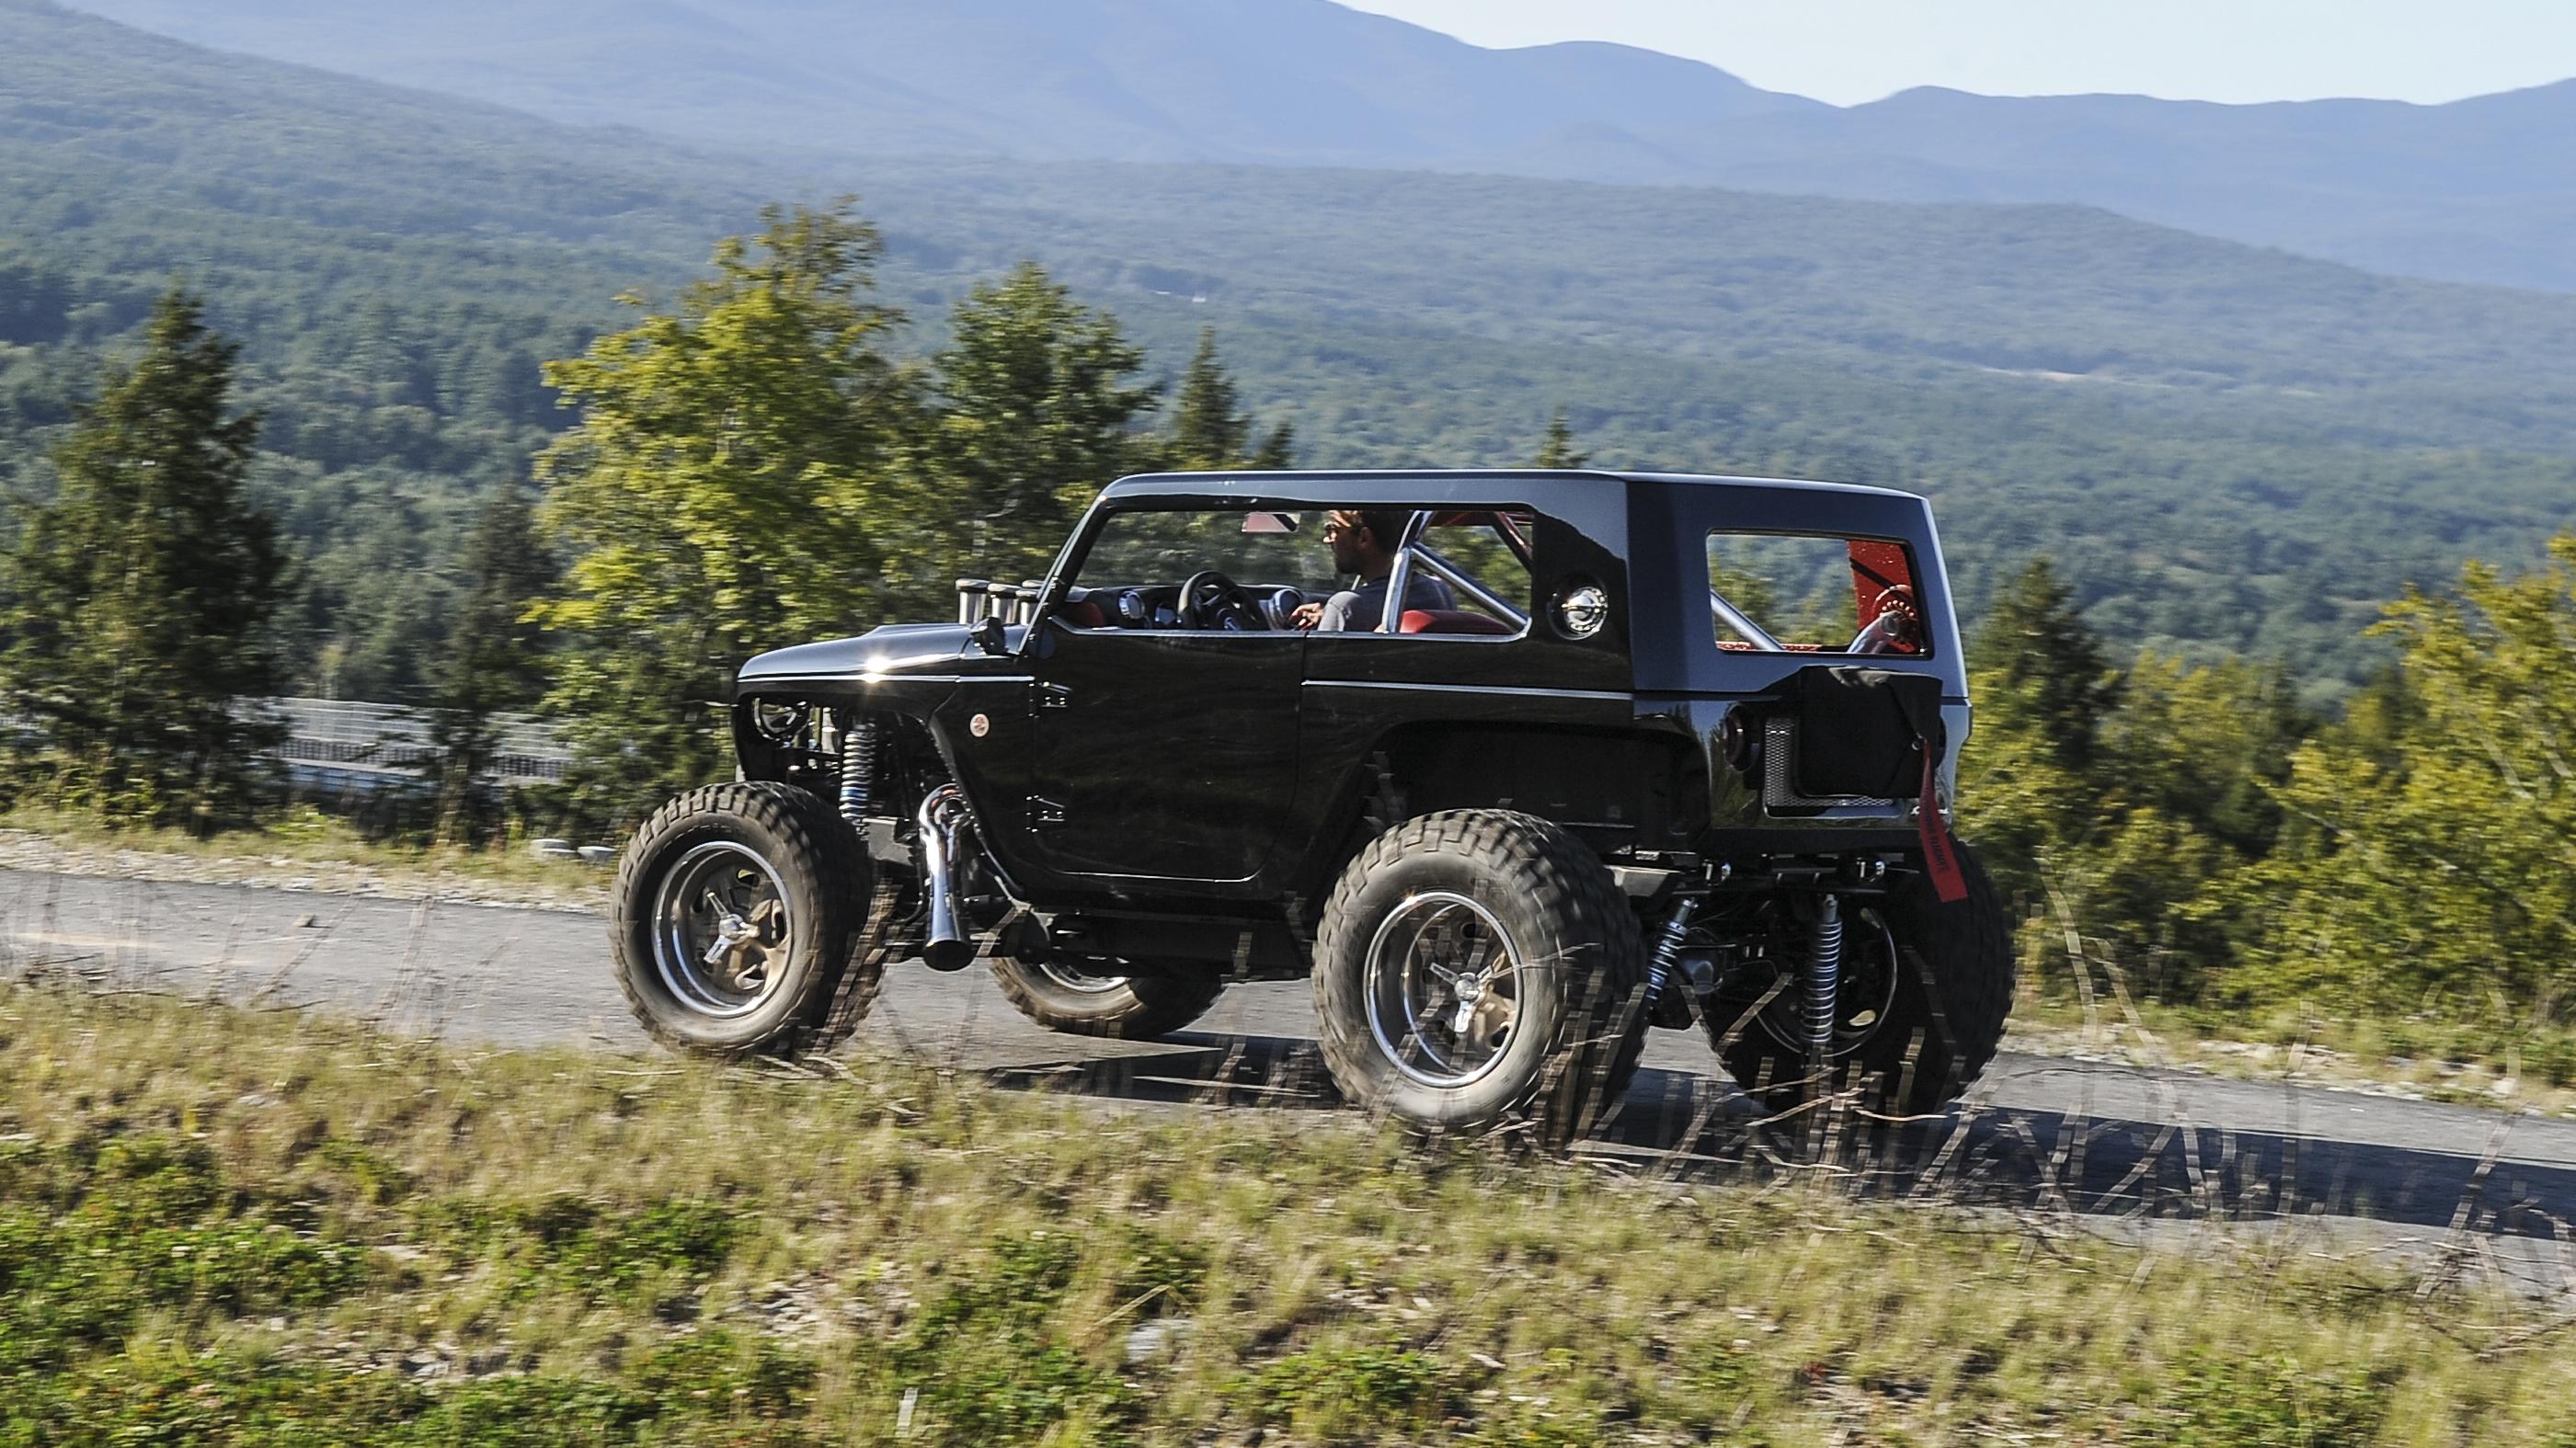 Jeep Quicksand Concept side